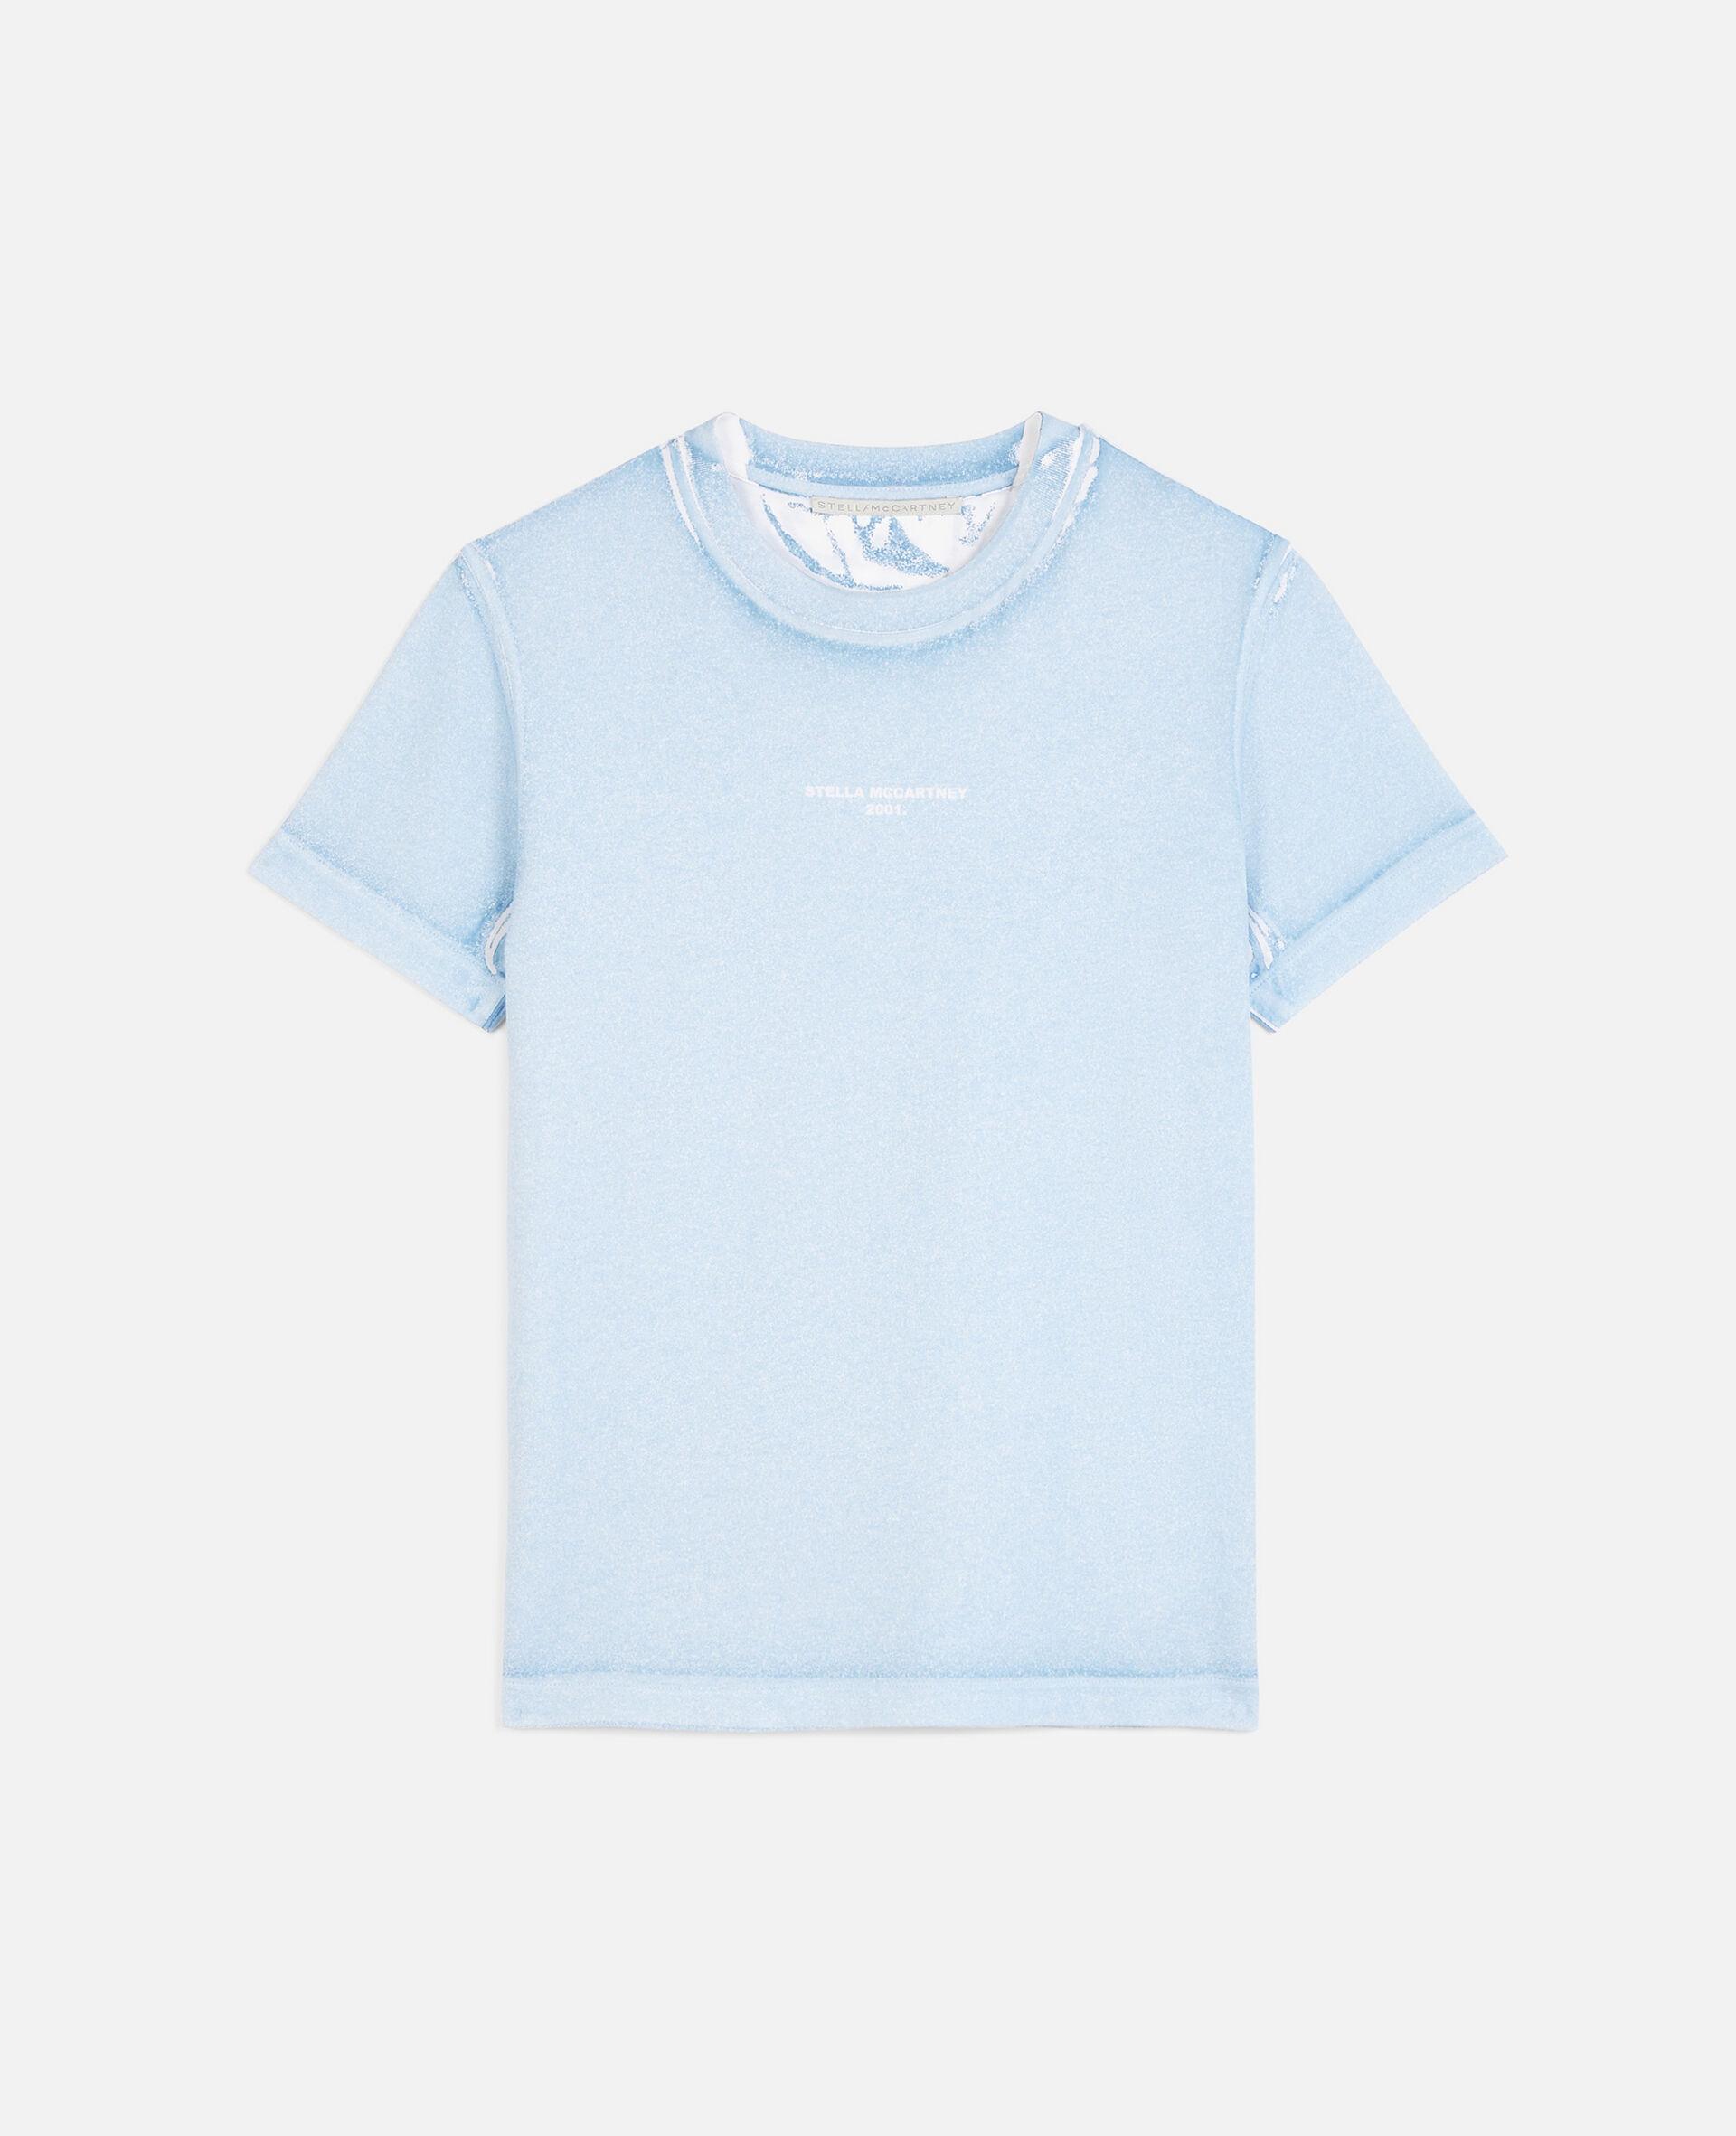 'Stella McCartney 2001.' T-shirt-Blue-large image number 0